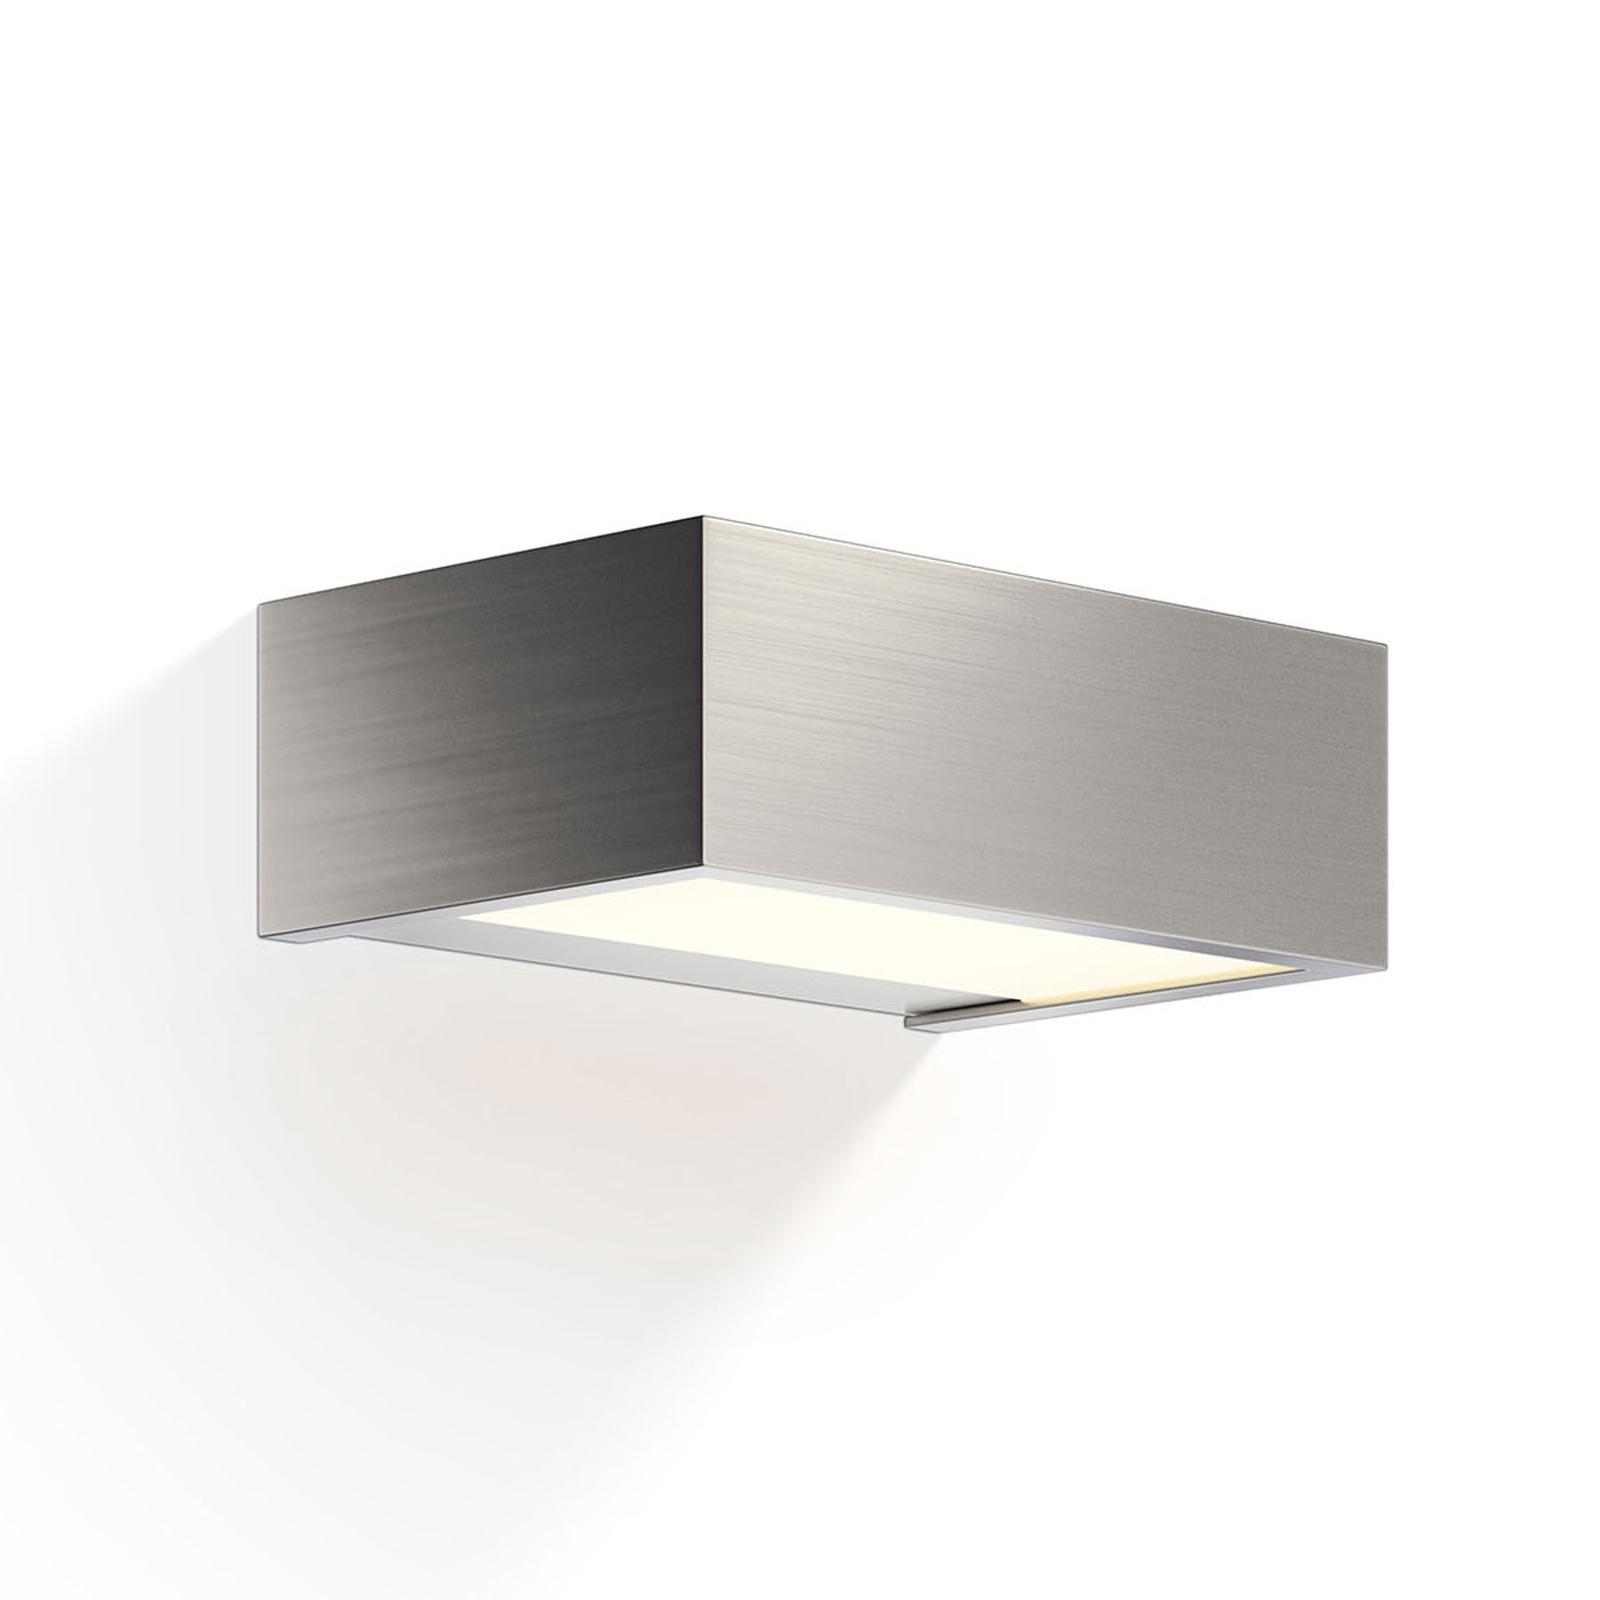 Decor Walther Box LED-vägglampa nickel 15 cm